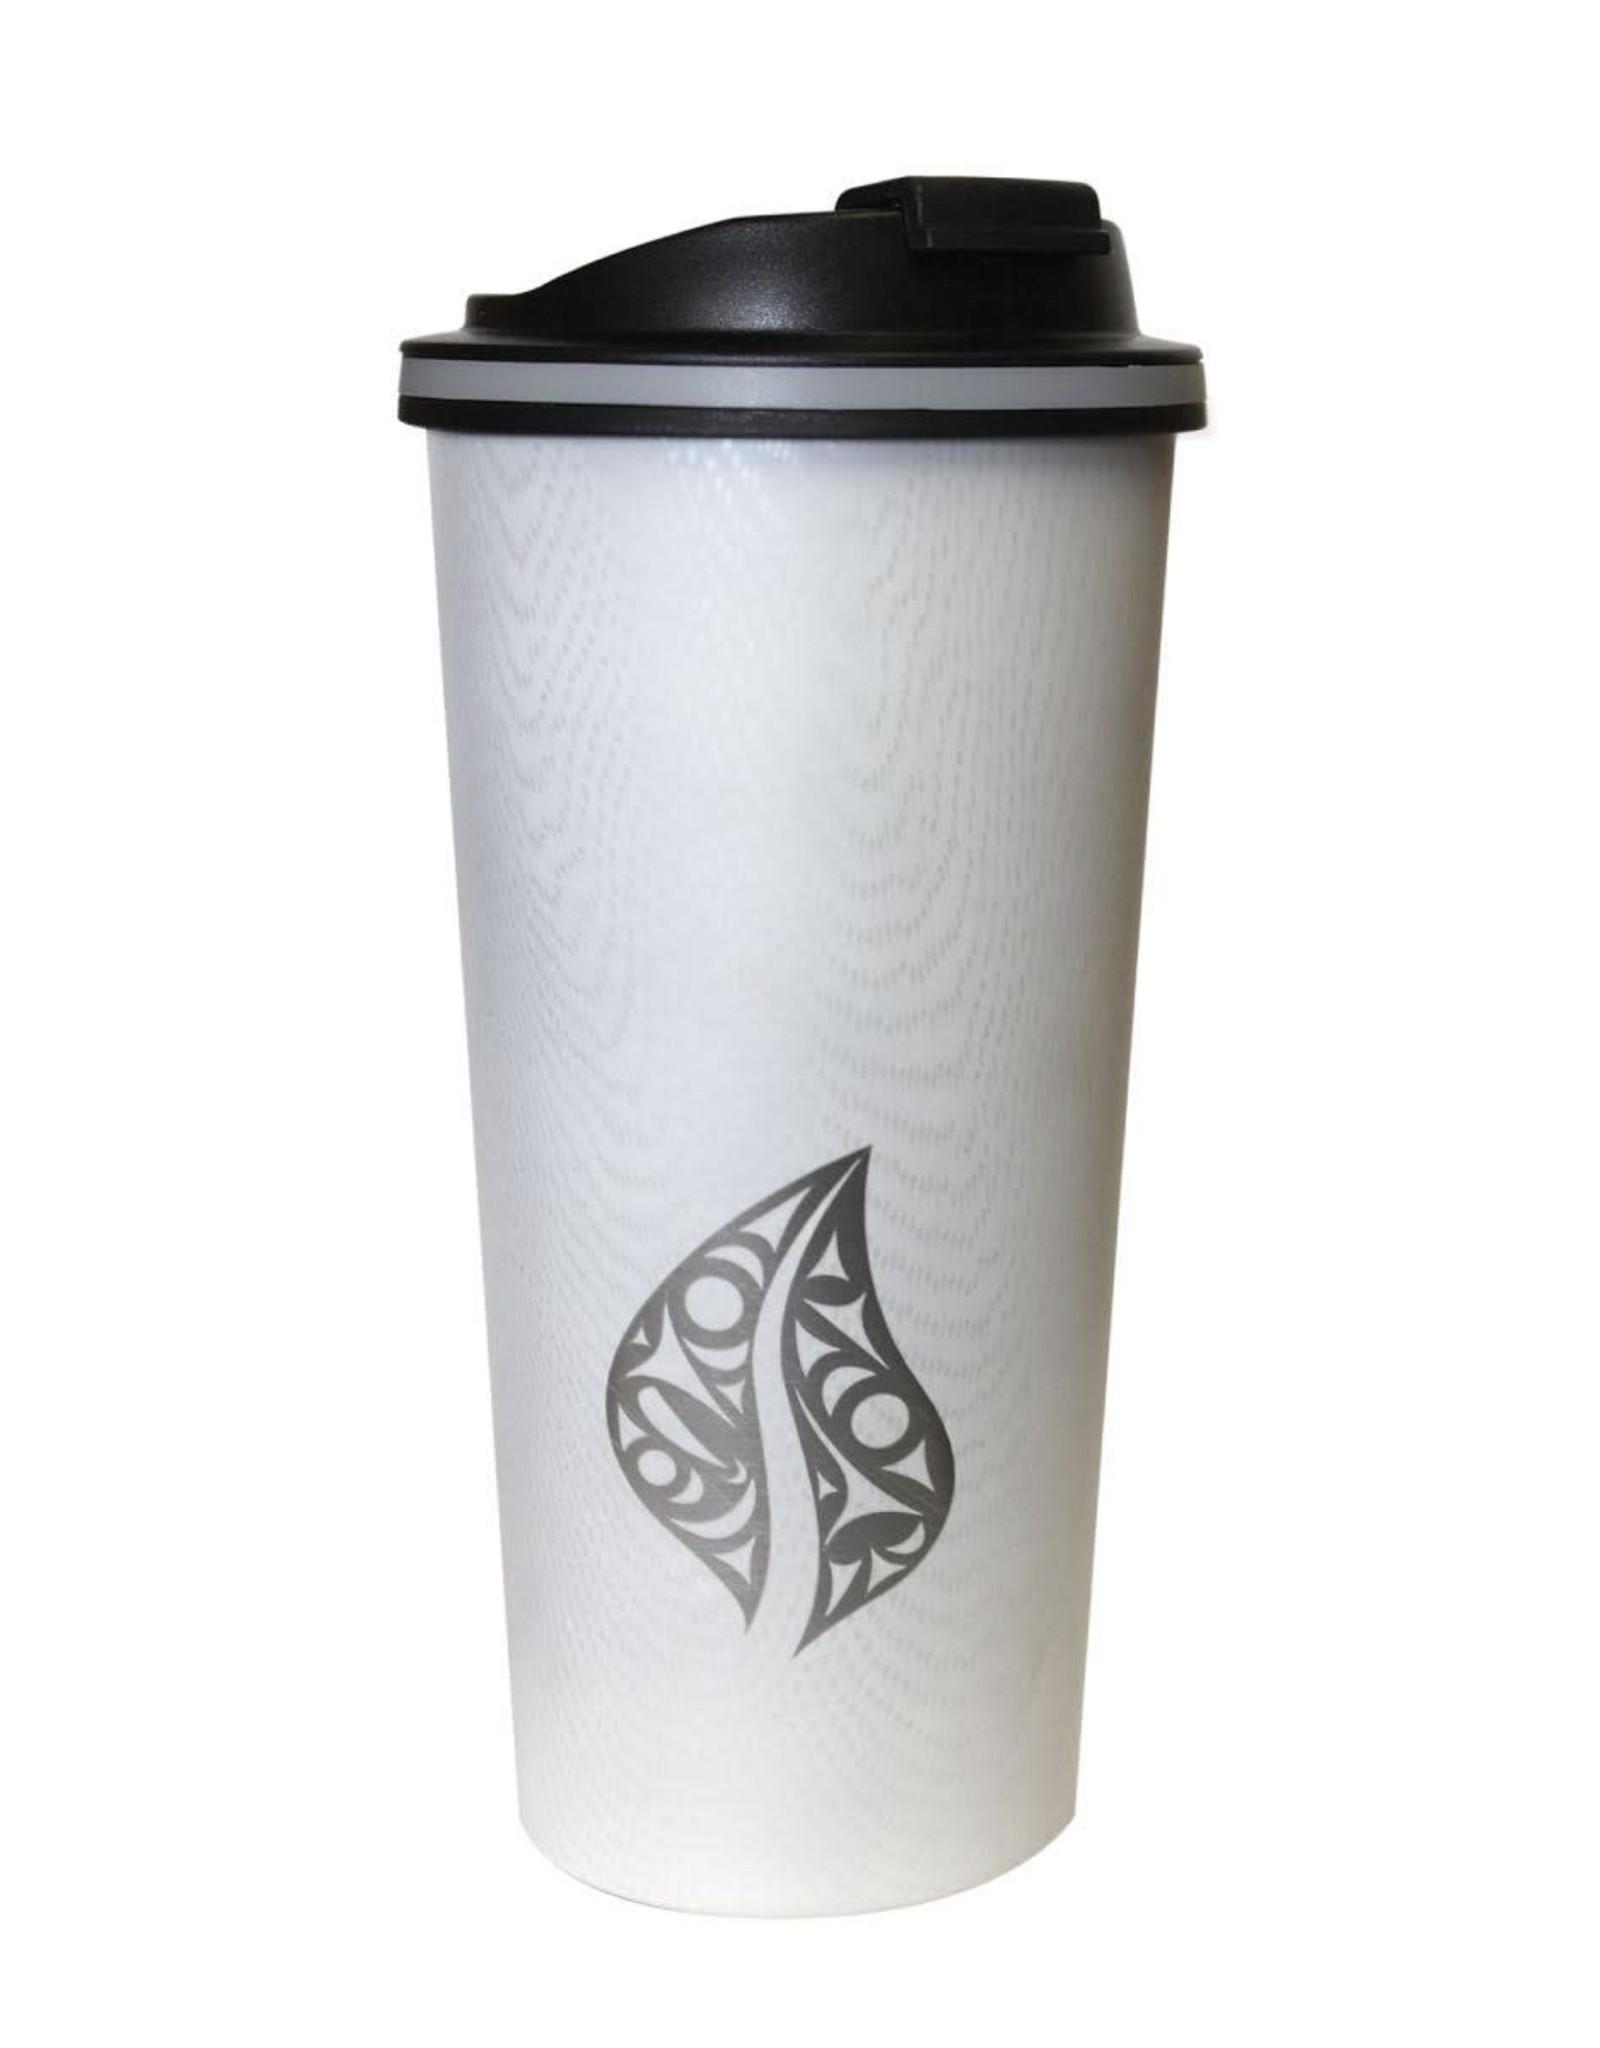 Travel Mug- Wood Grain style.